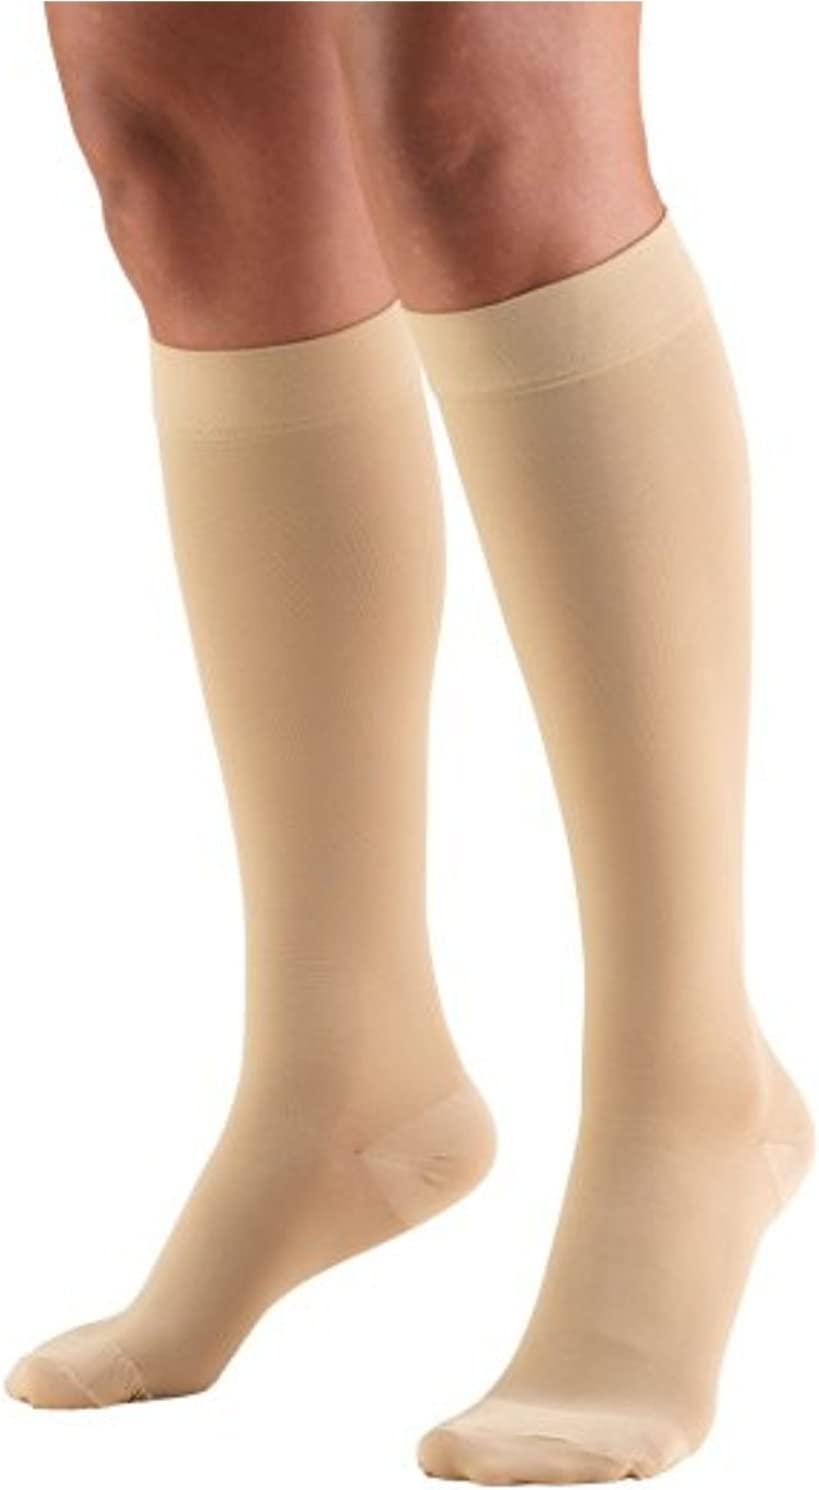 Truform Daily bargain sale 15-20 mmHg Compression Stockings for Men San Antonio Mall and Knee Women